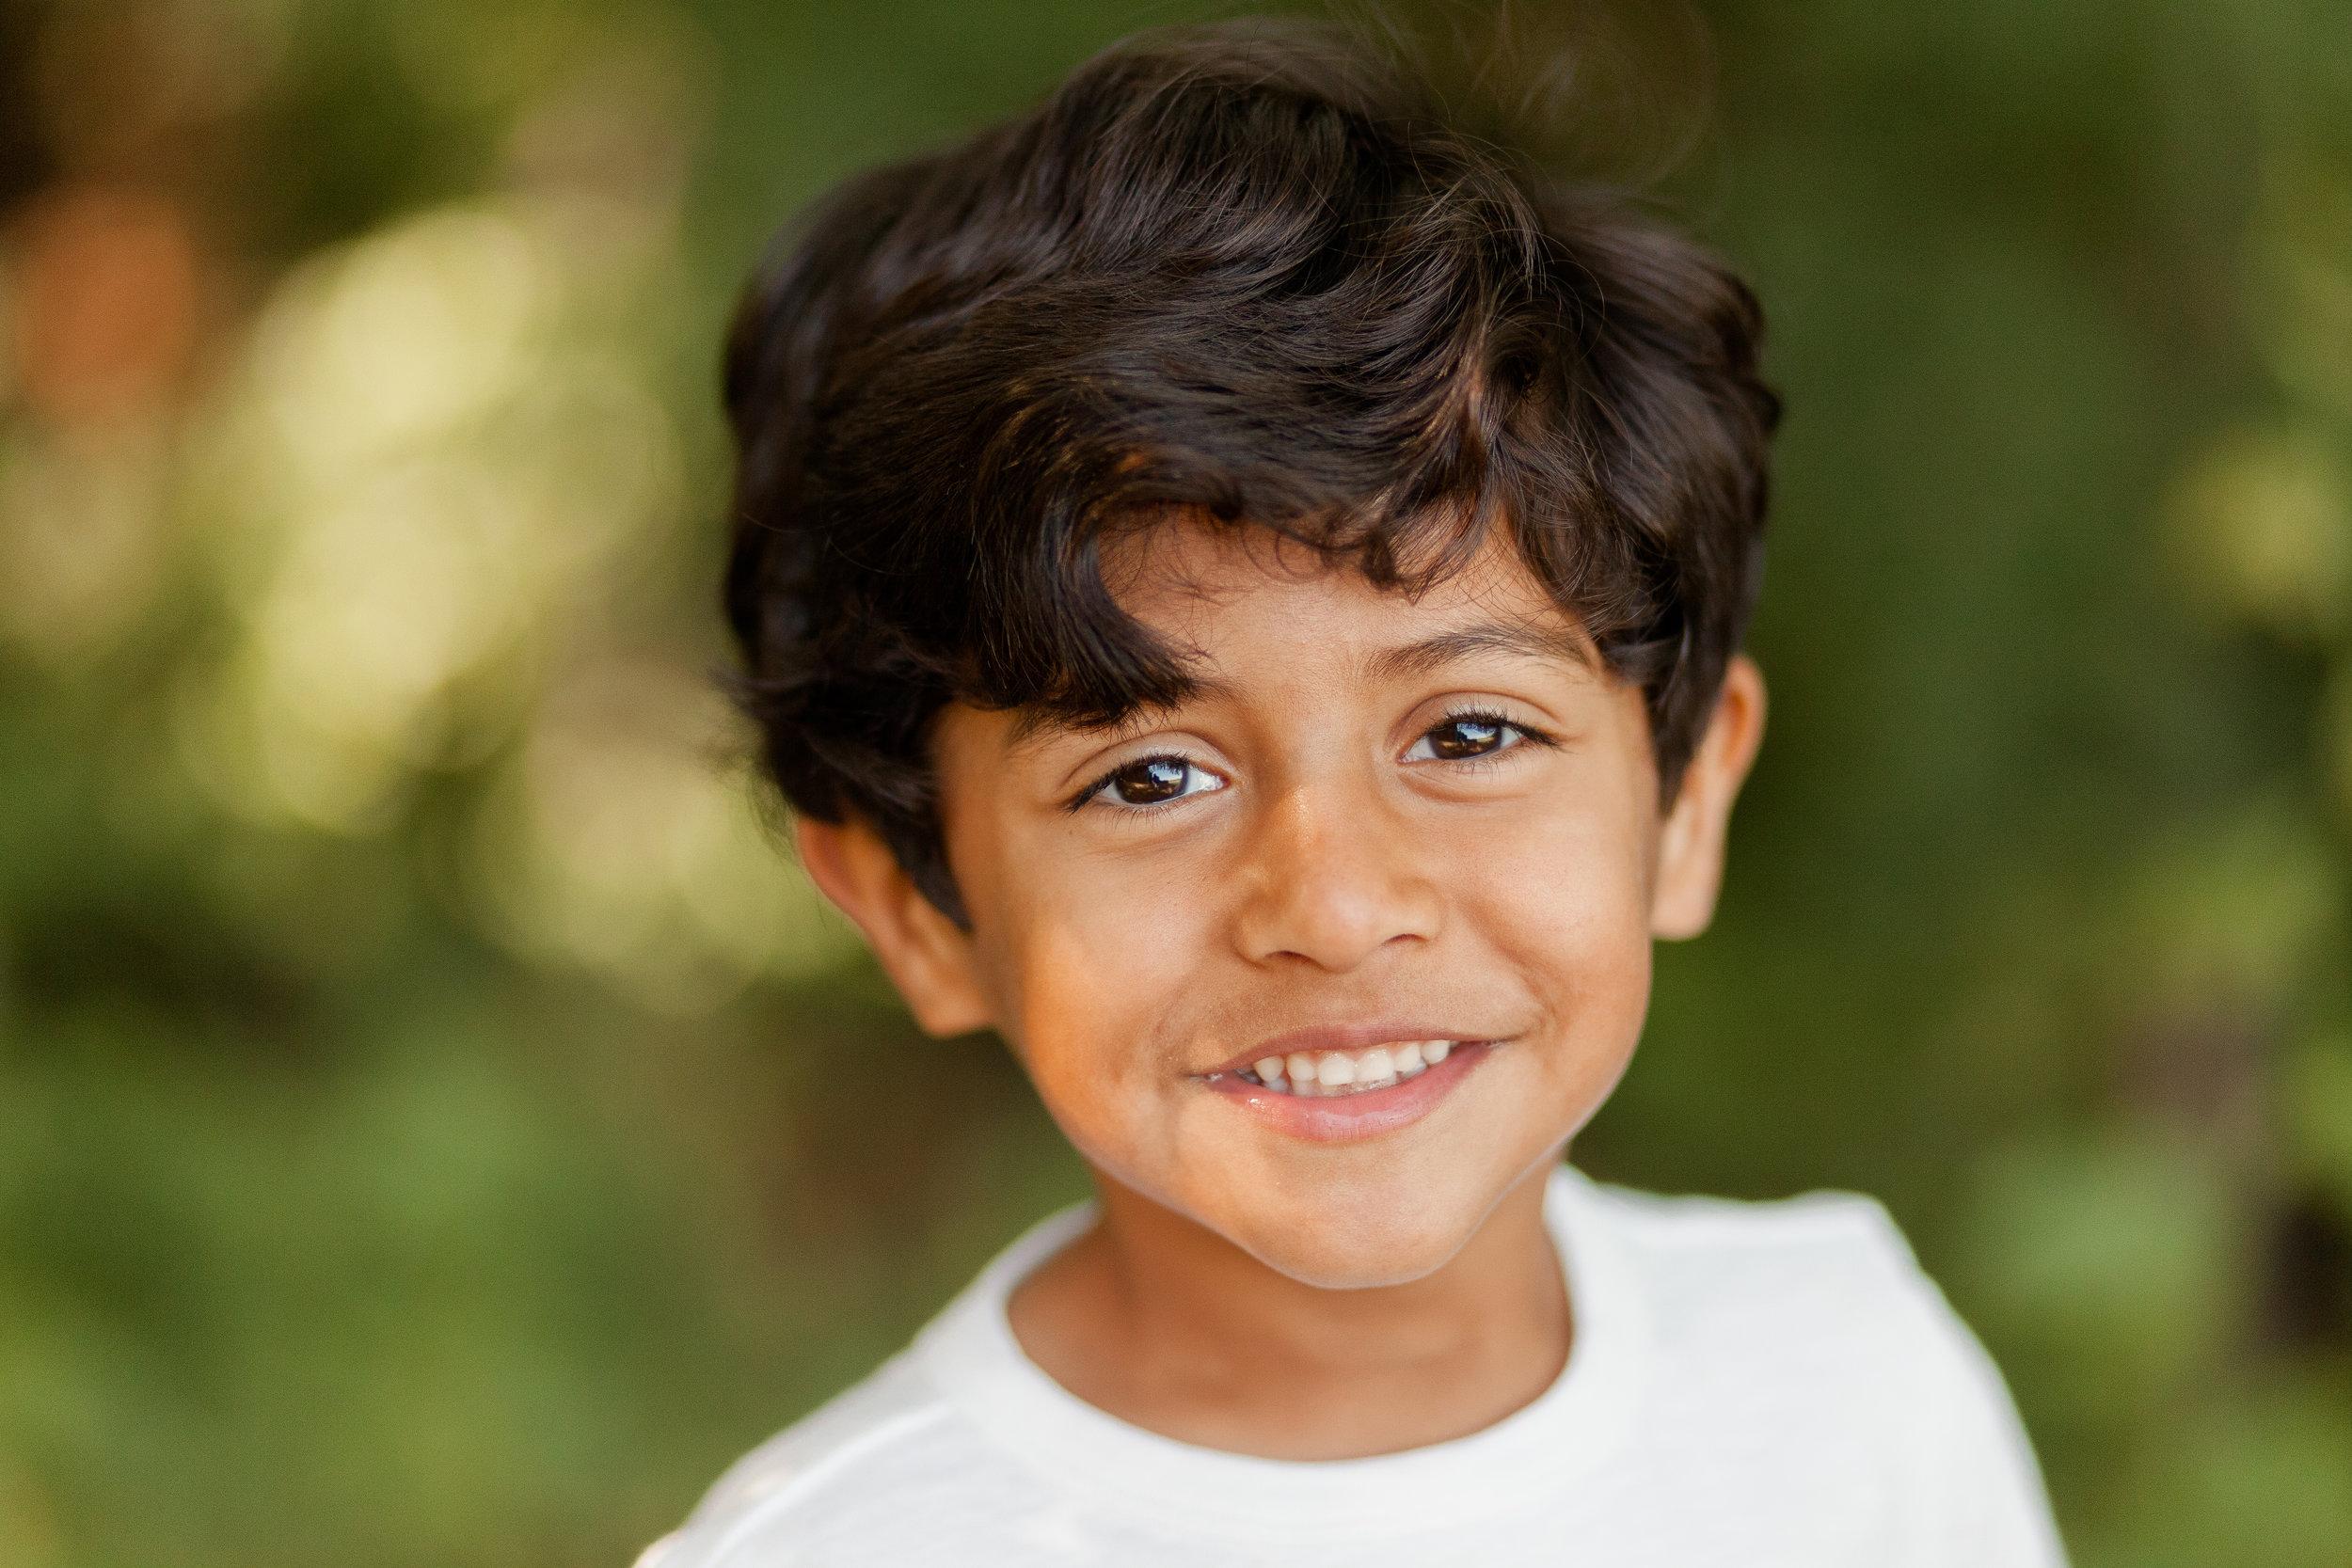 Natural Photo Child